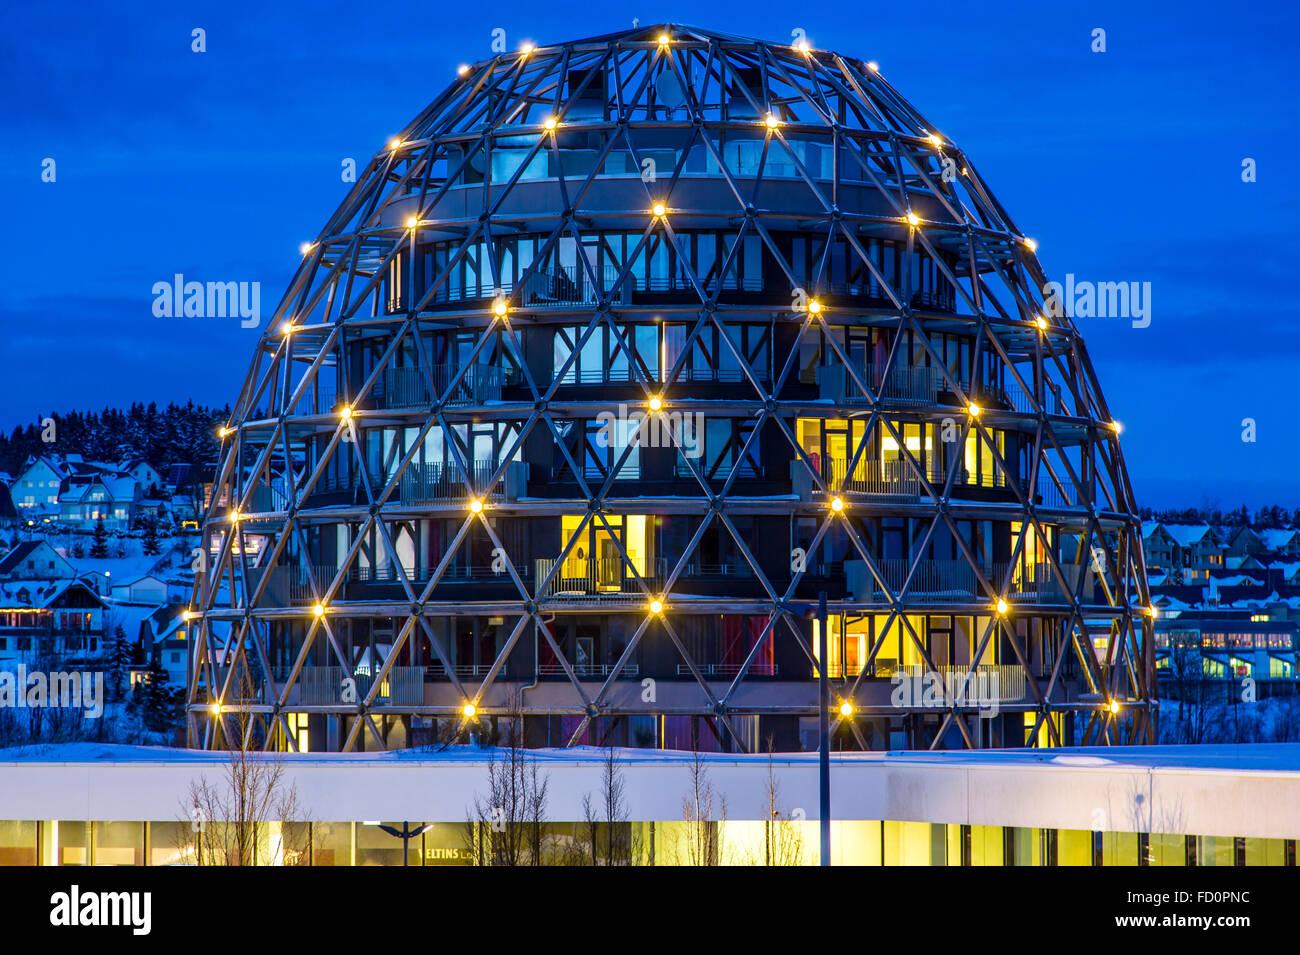 Oversum hotel and resort winterberg sauerland area for Designhotel winterberg